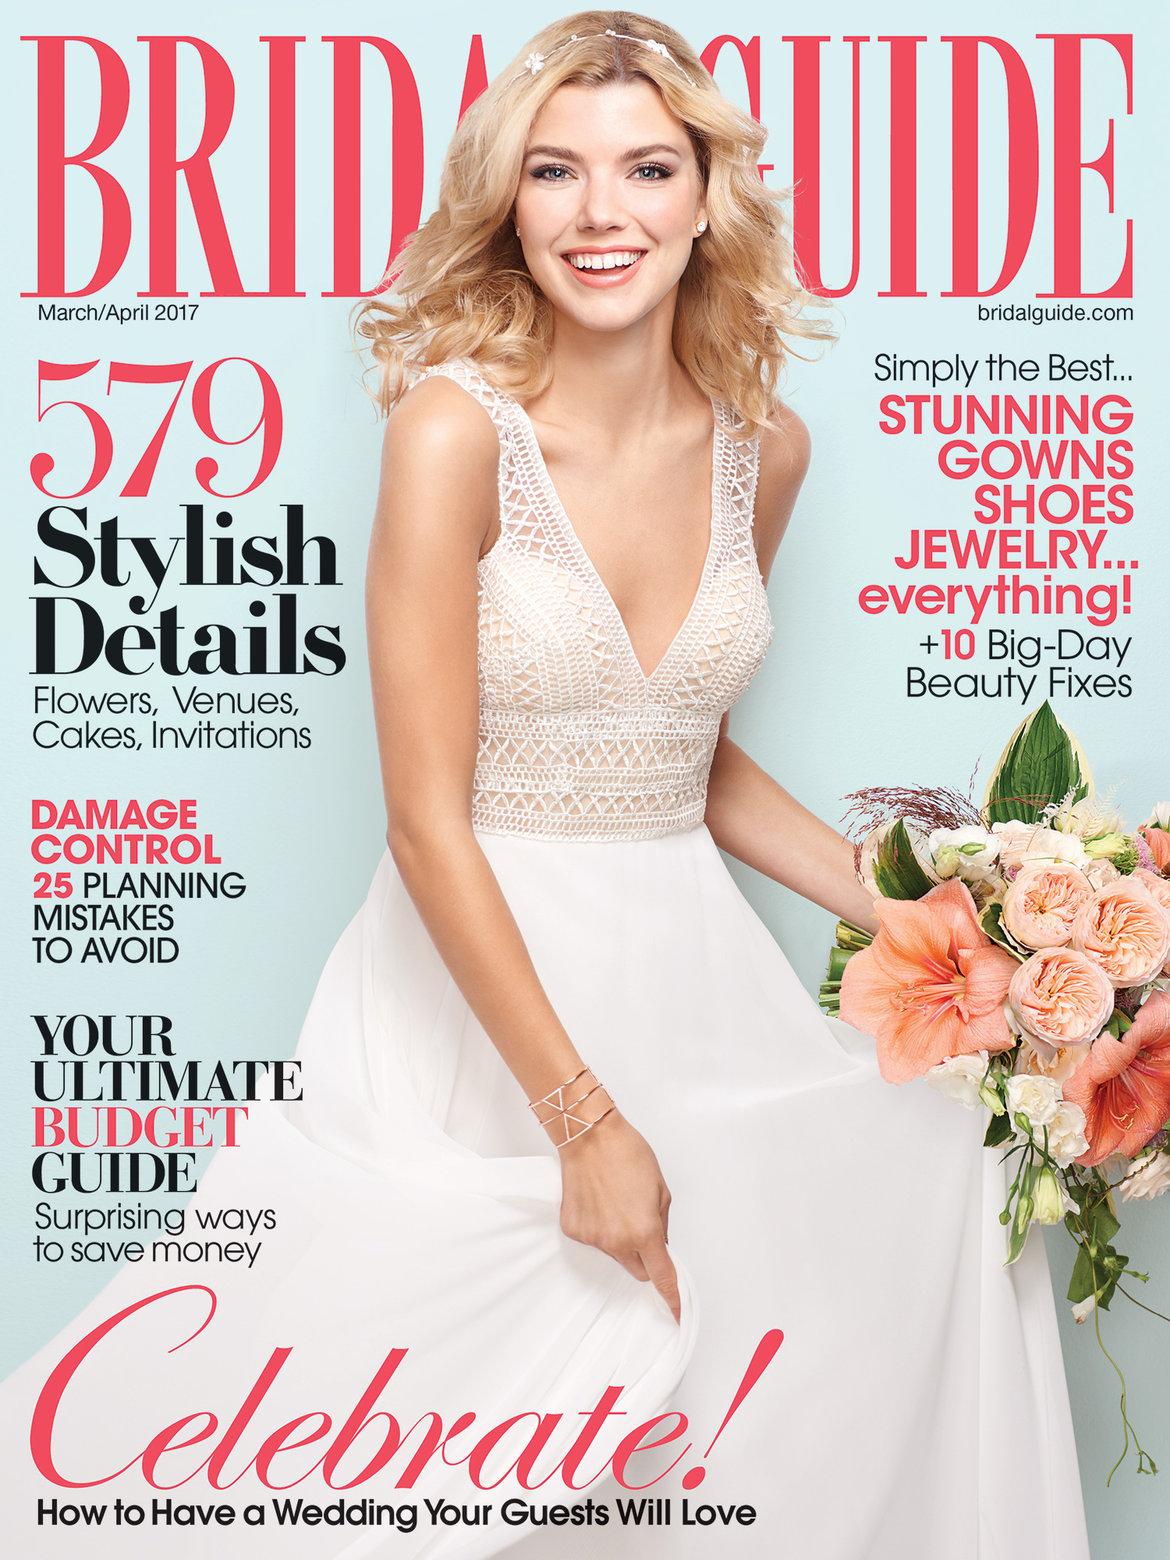 BRIDAL GUIDE: wedding trend alternatives